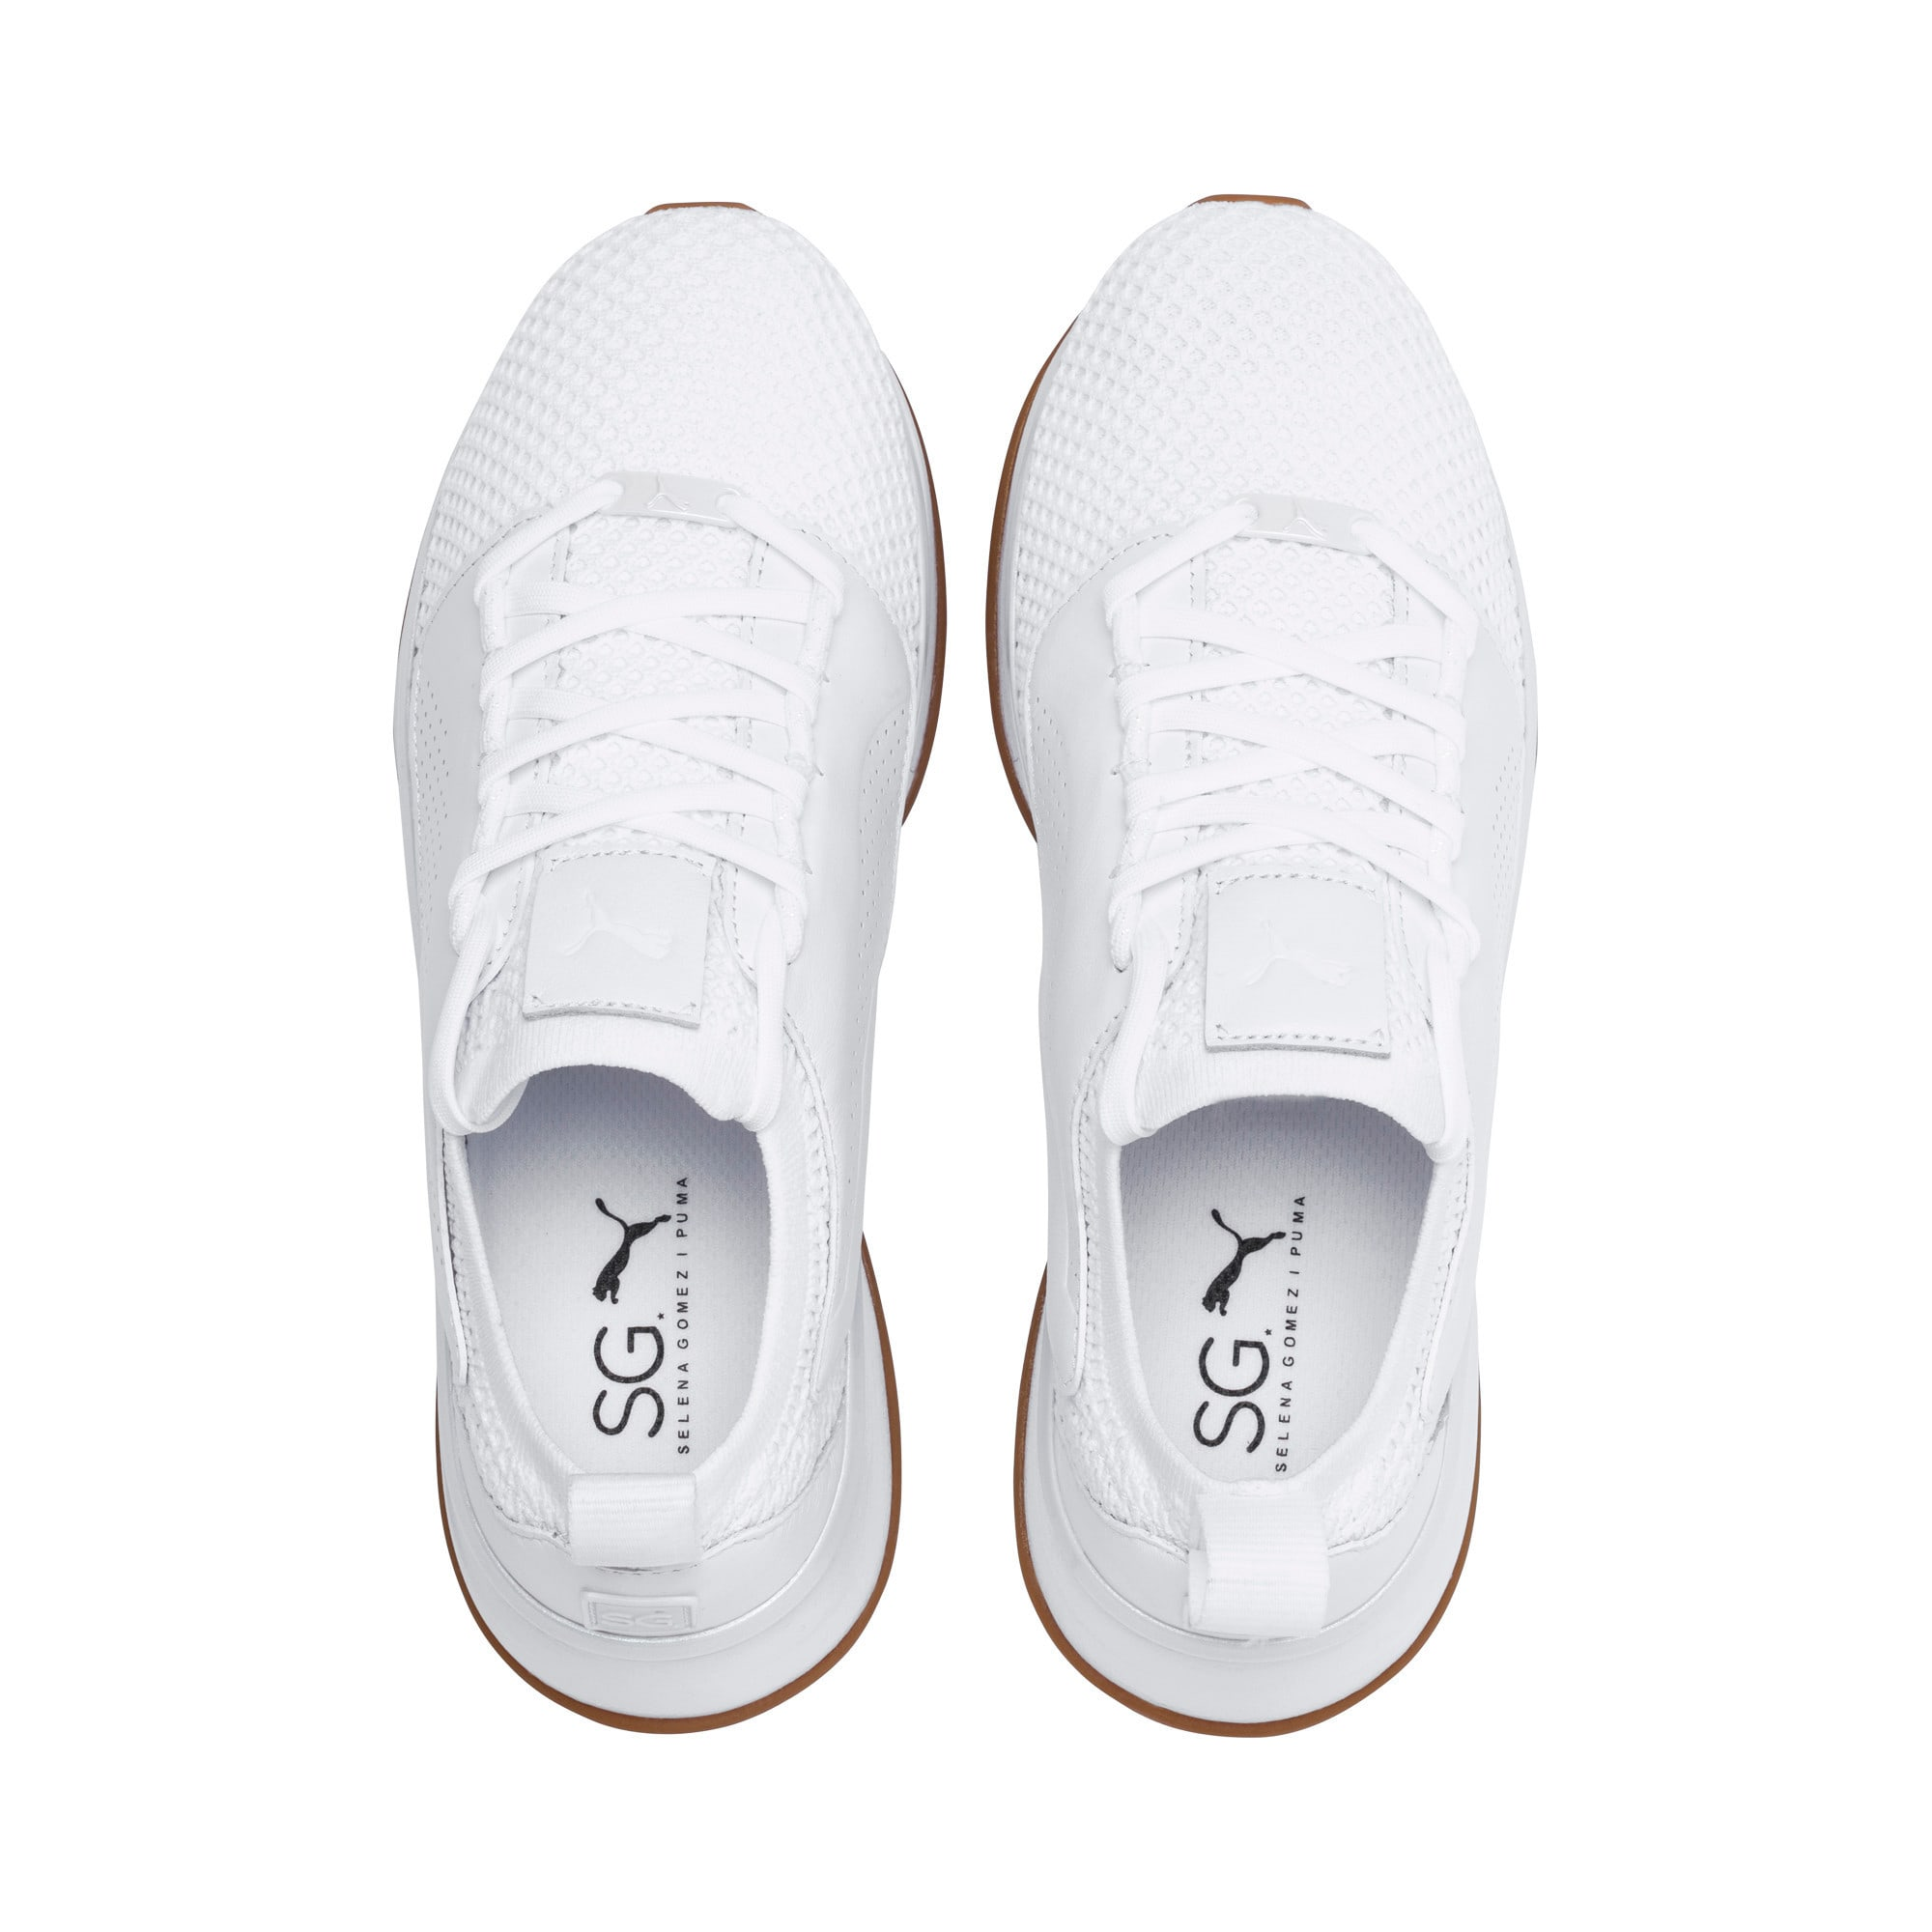 Thumbnail 6 of PUMA x SELENA GOMEZ Runner Women's Training Shoes, Puma White, medium-IND